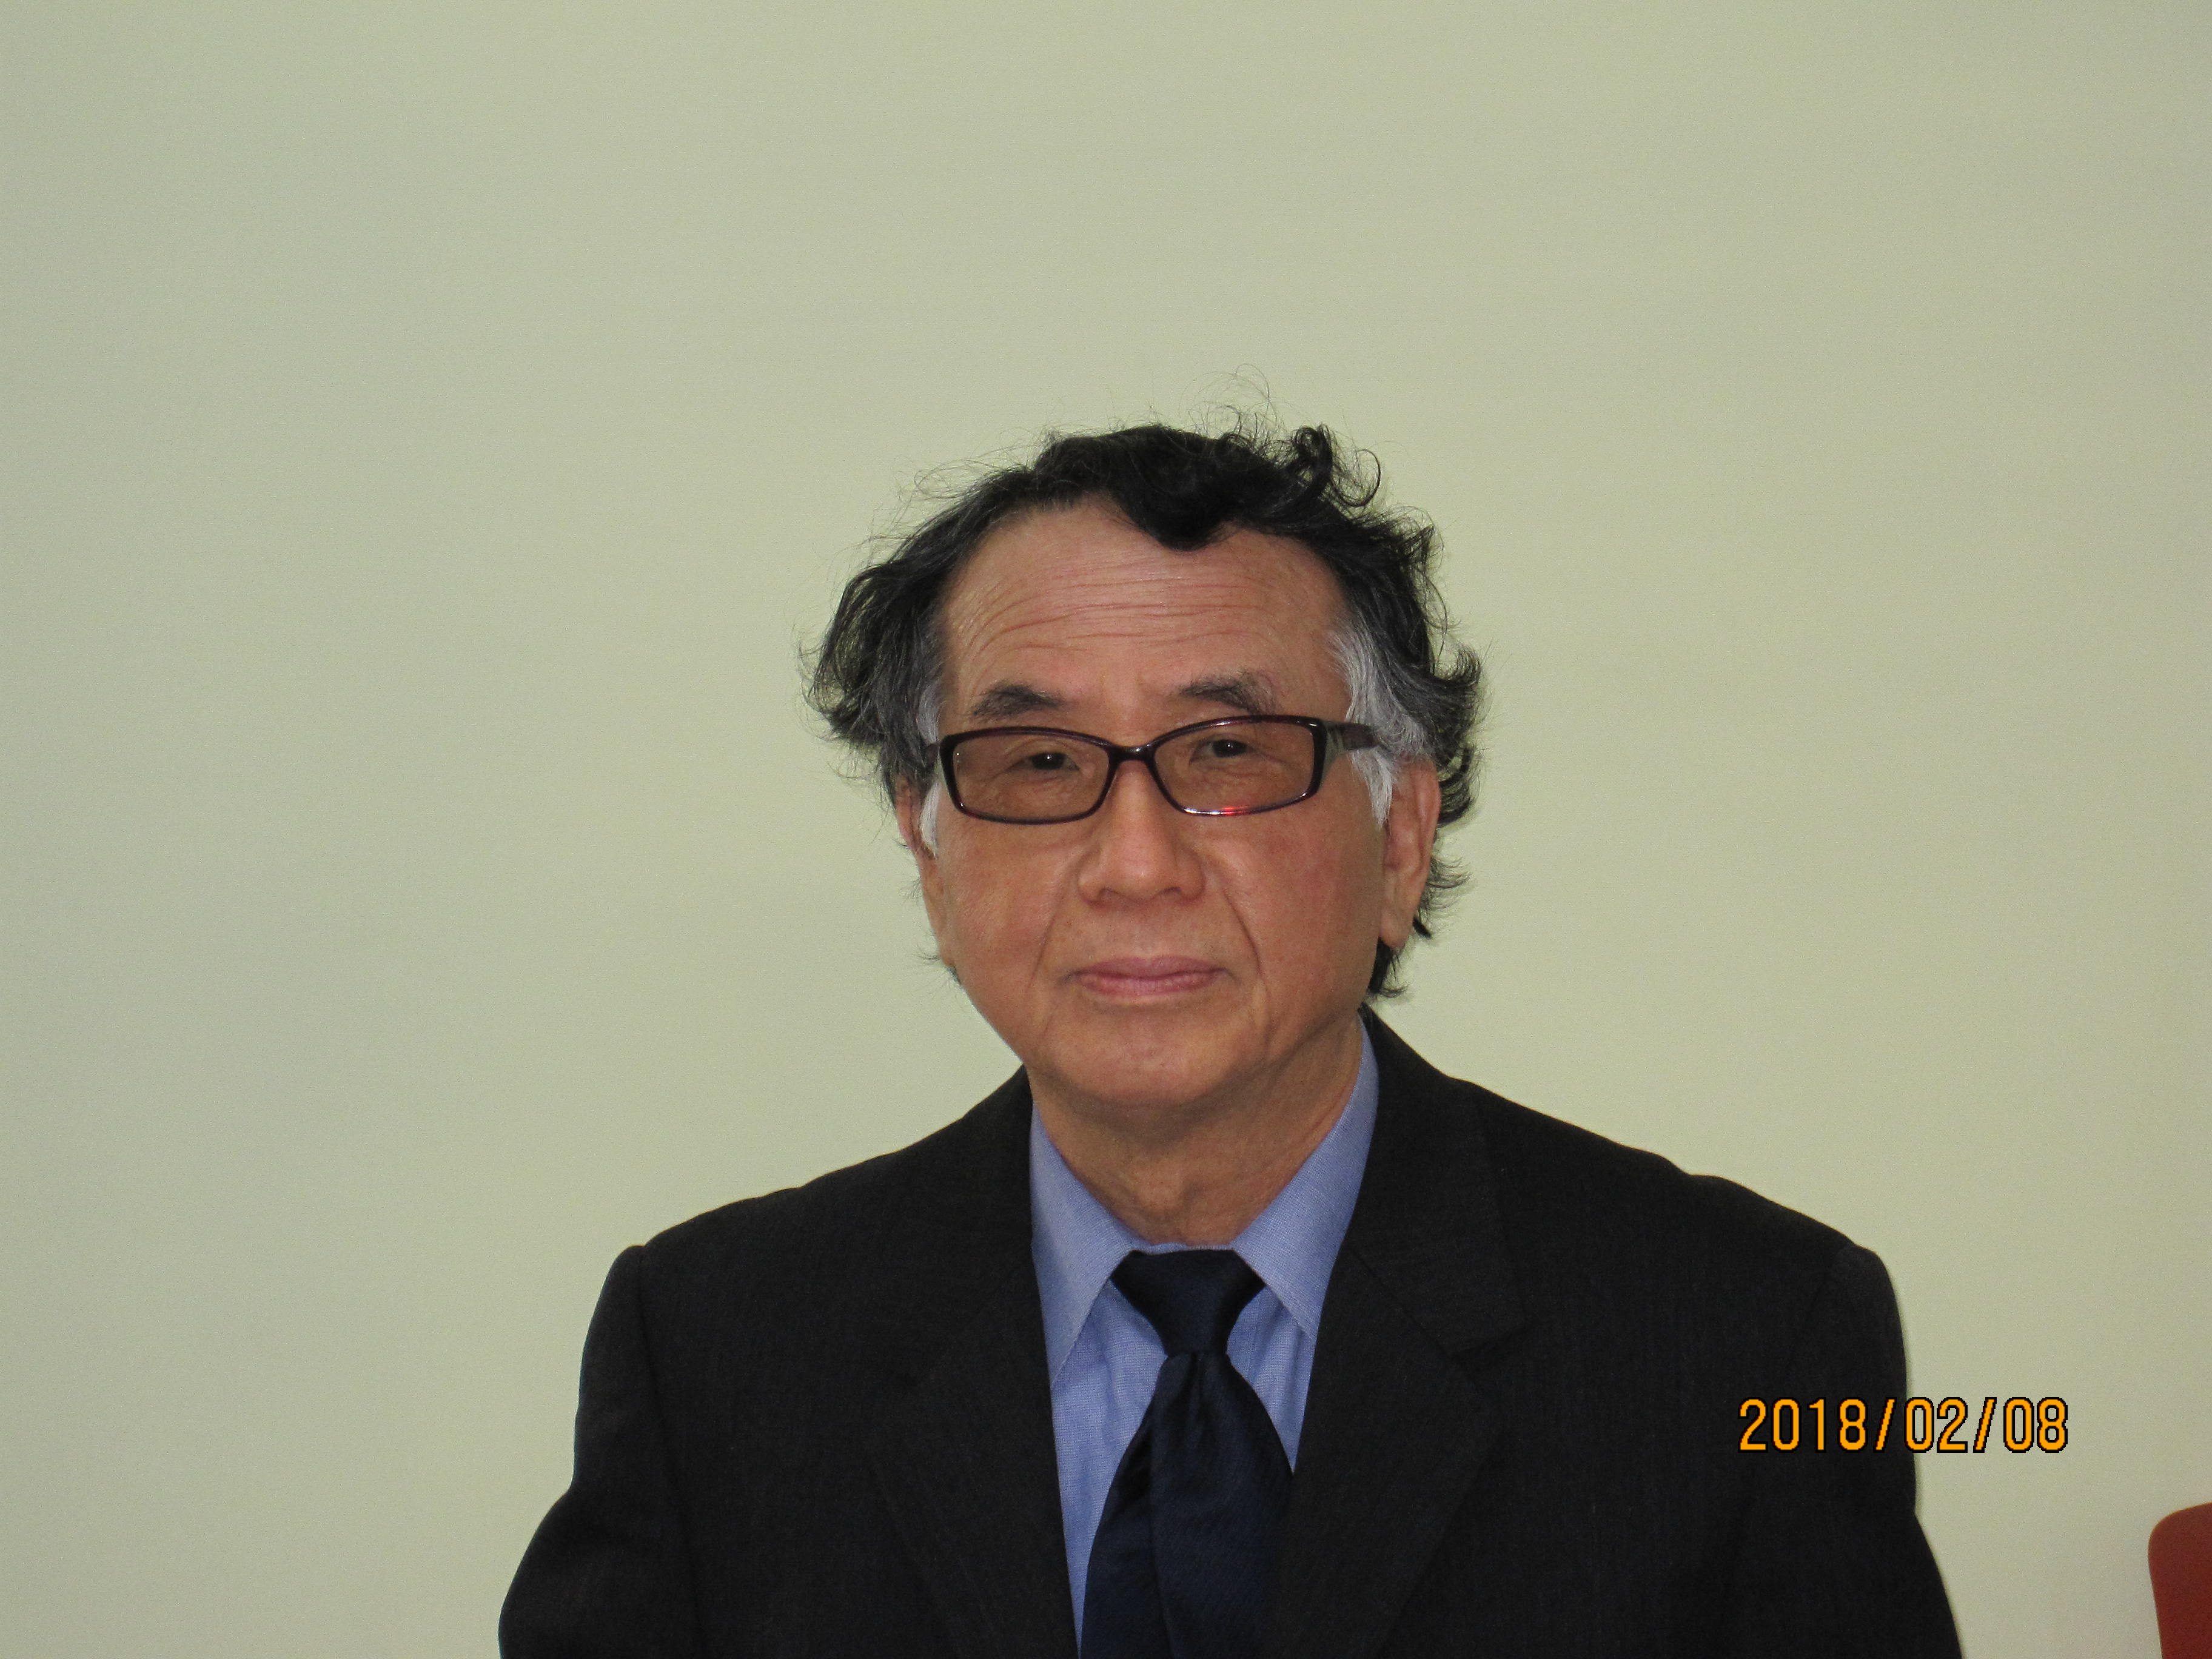 Meetings International - Dental Meeting 2018 Conference Session Speaker Fumio Yamada photo